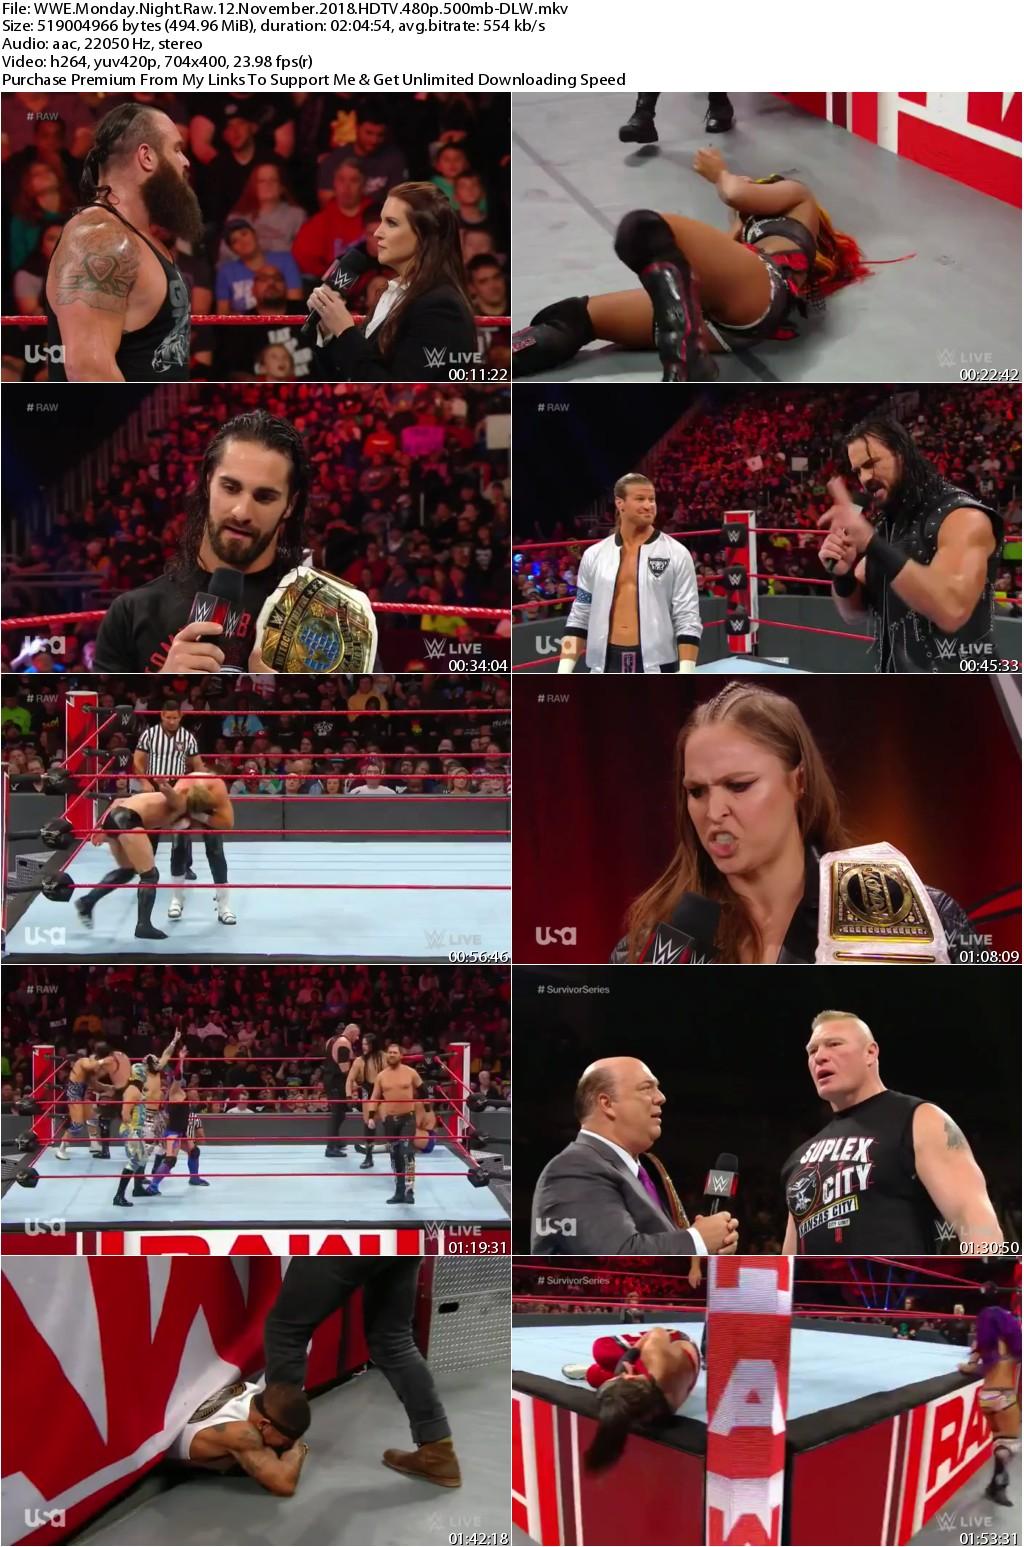 WWE Monday Night Raw 12 November 2018 HDTV 480p 500mb-DLW